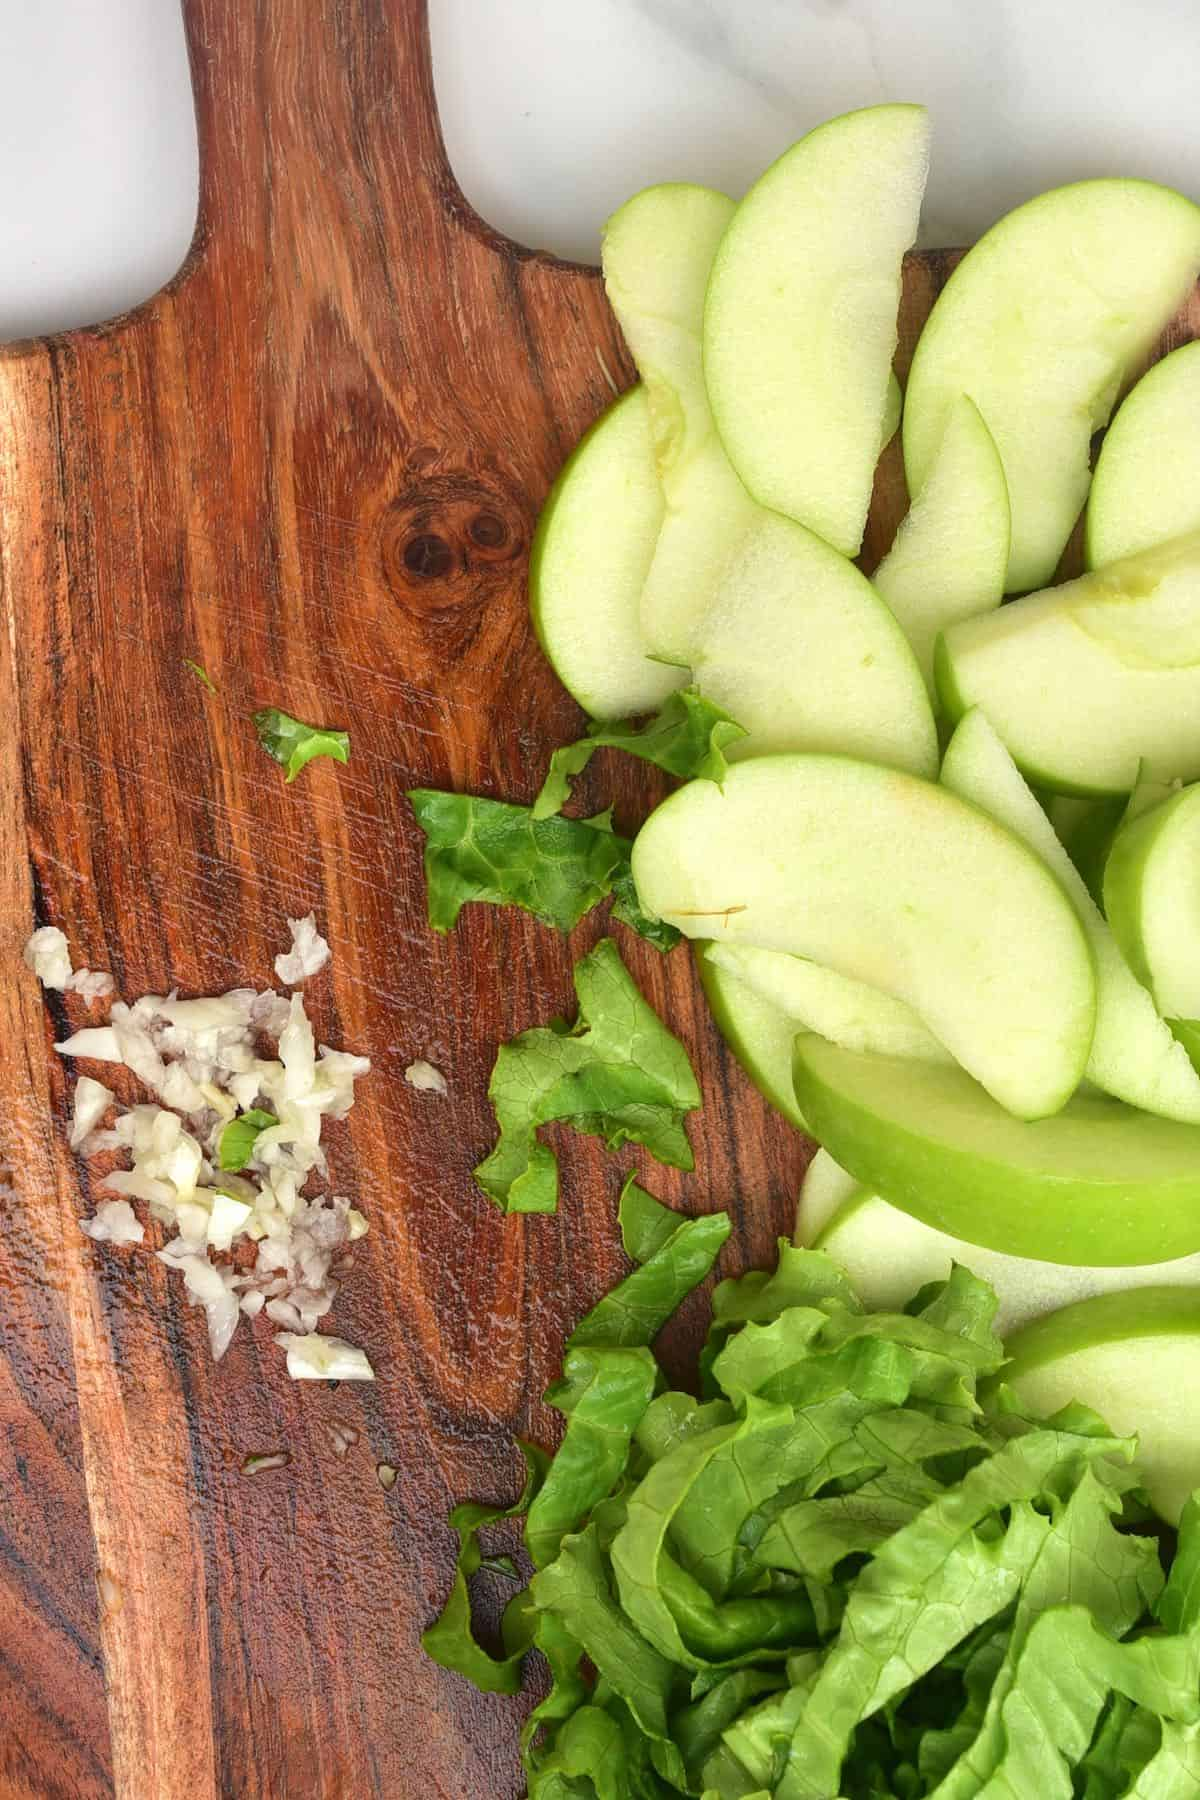 Choped apples